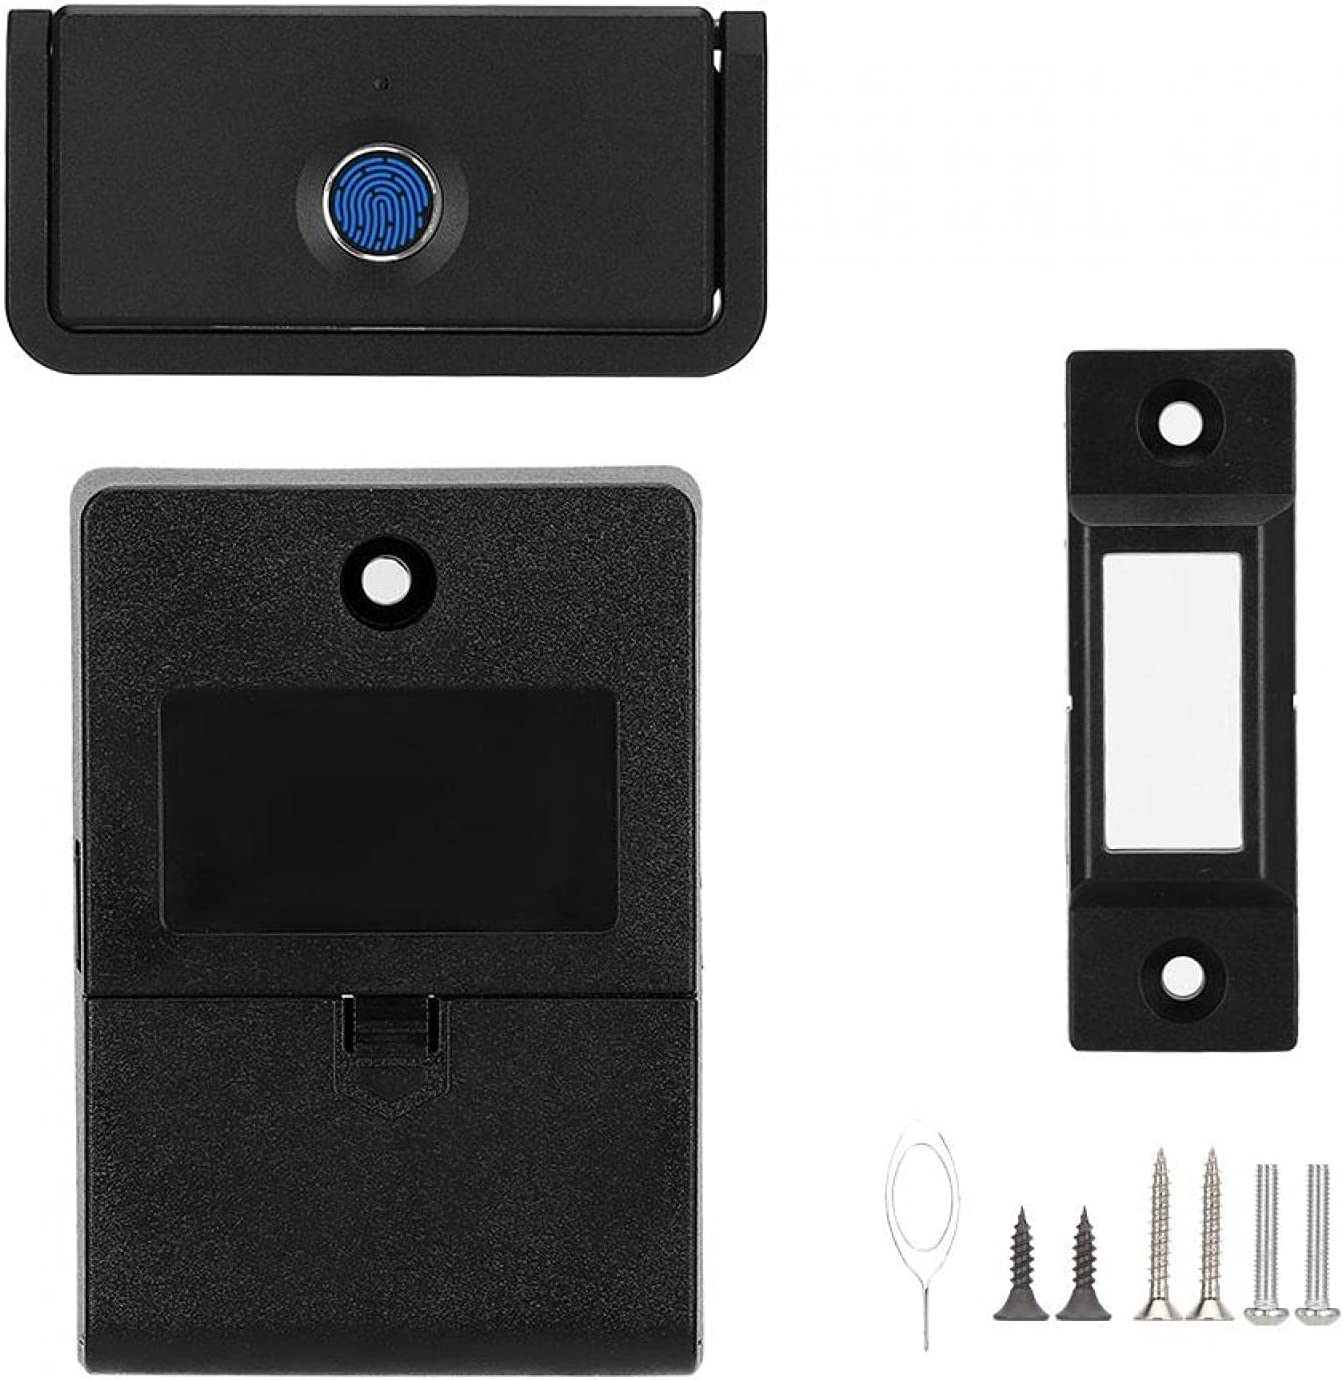 New Free Shipping Fingerprint Lock Smart Max 64% OFF USB Charging Door Automatic Port Lo